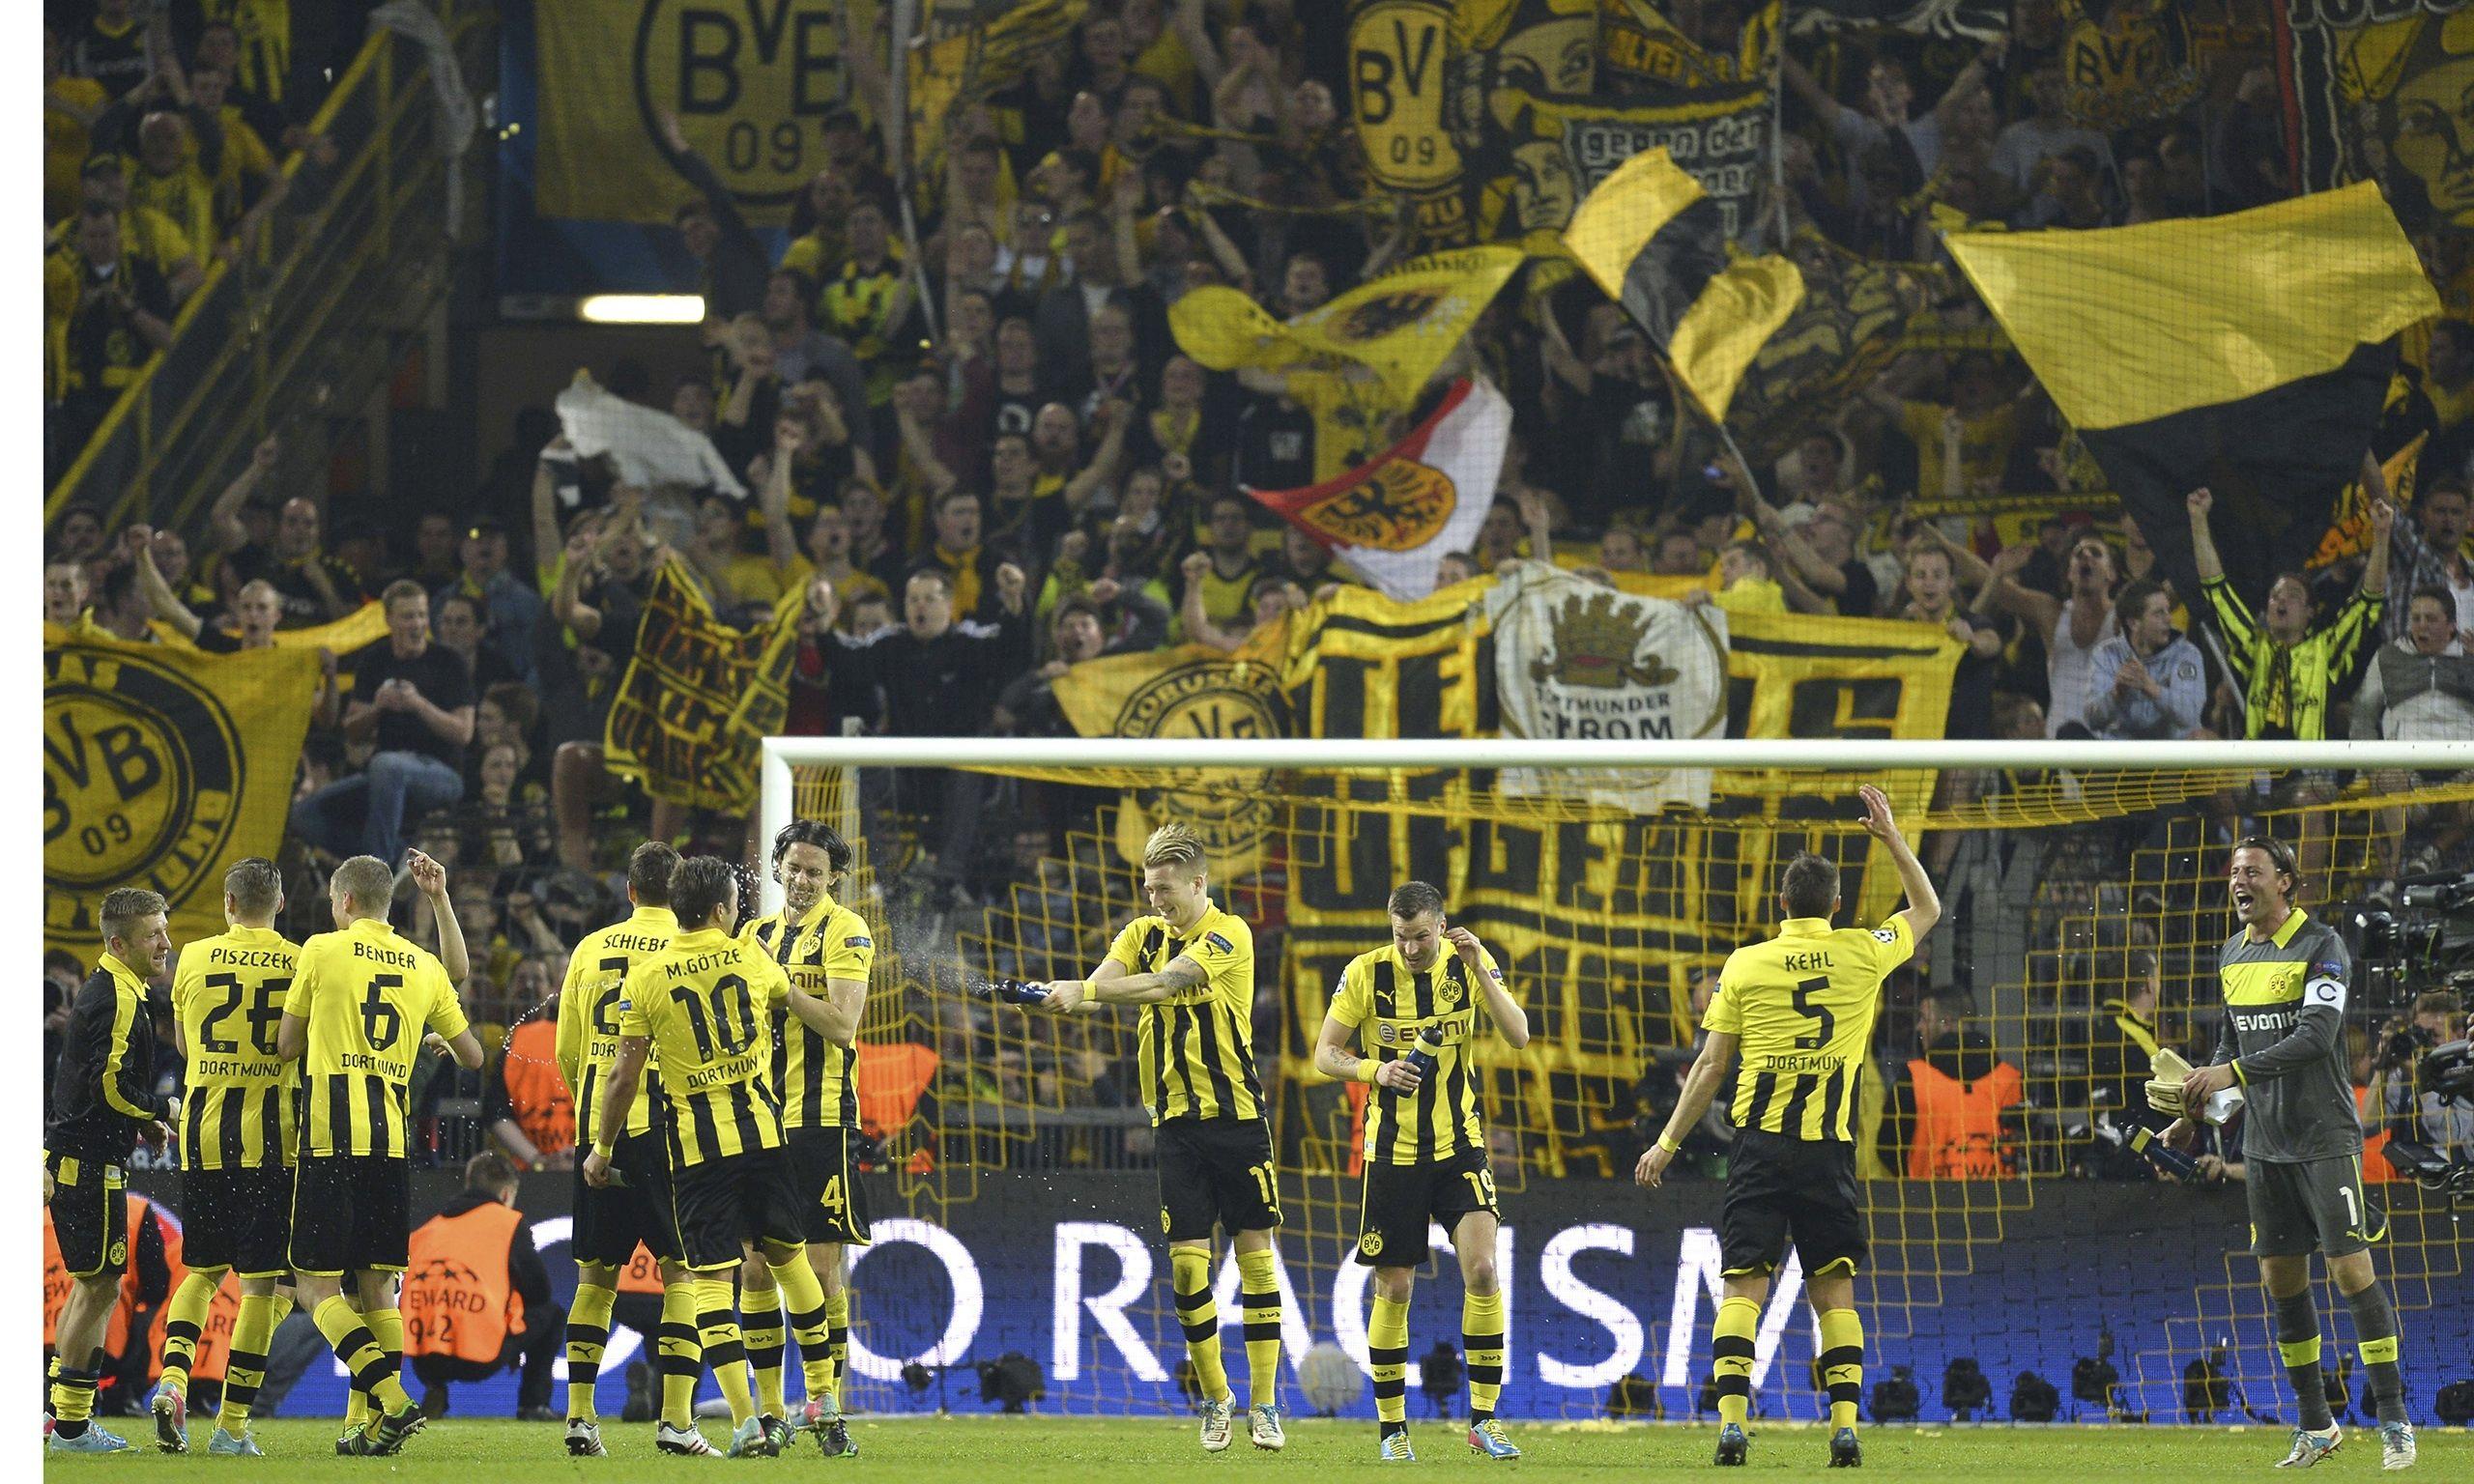 Borussia Dortmund Wallpaper Fans 2015 Photos Dortmund Players Celebrating With Fans 2369788 Hd Wallpaper Backgrounds Download